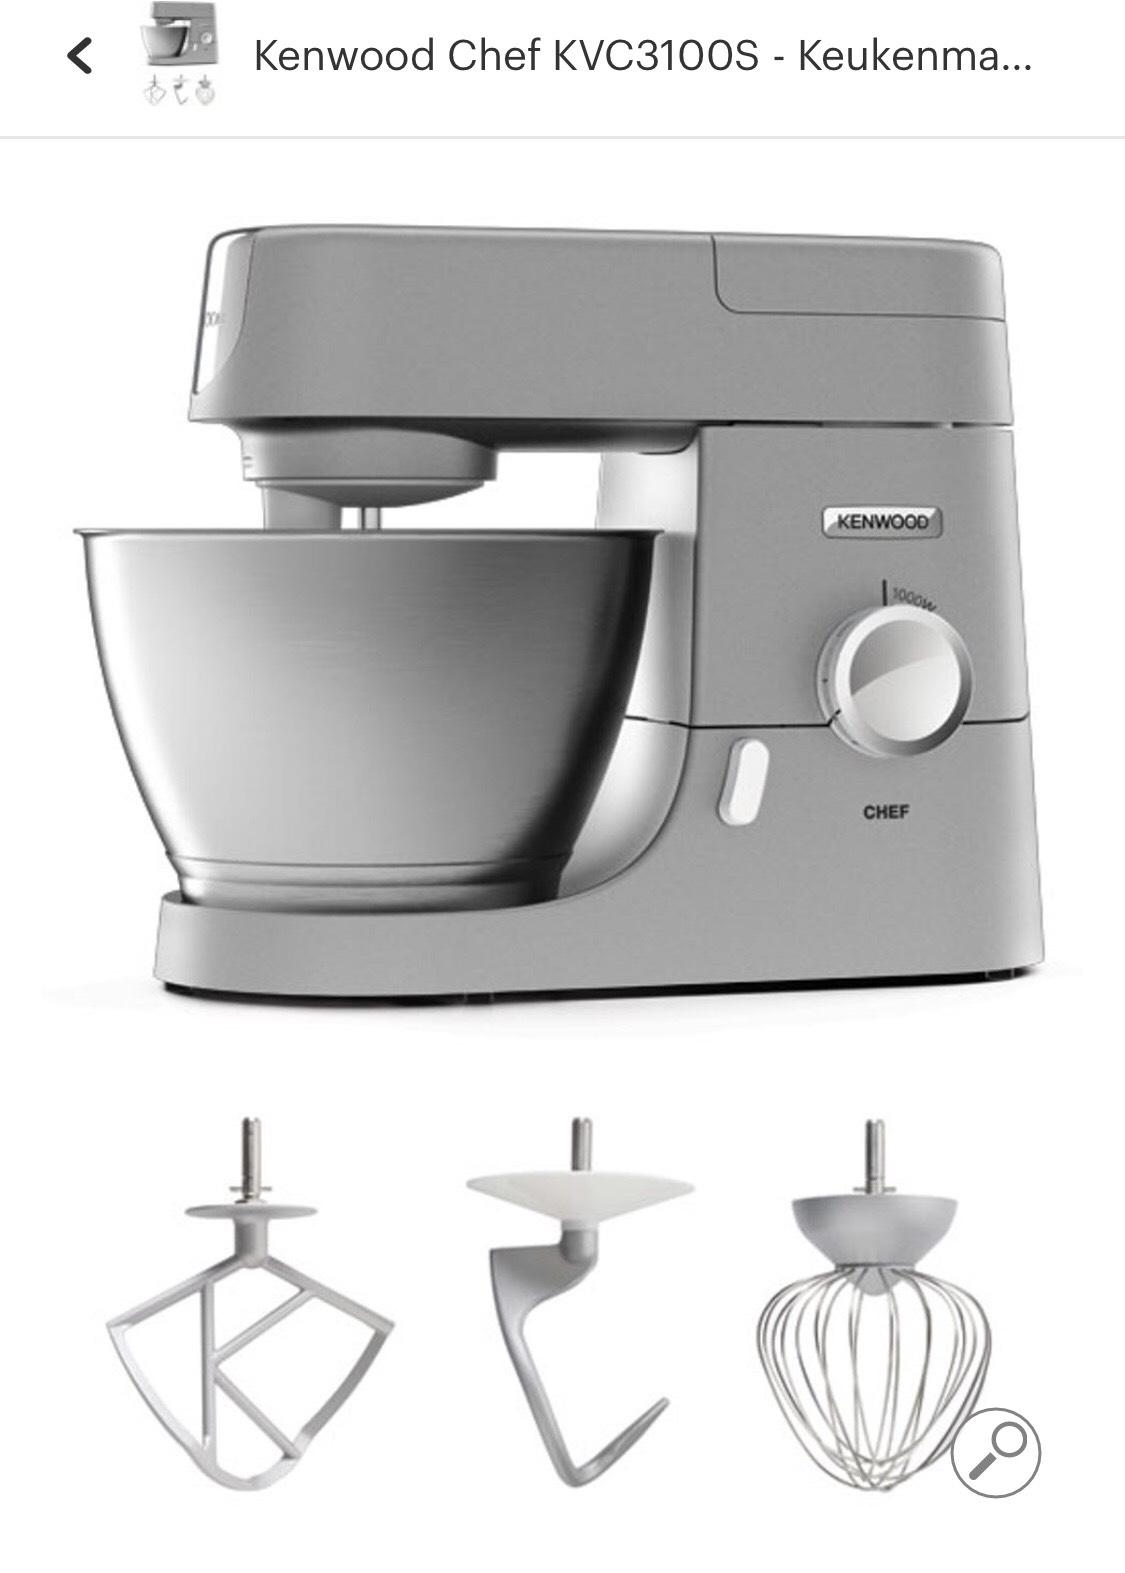 Kenwood KVC3100S keukenmachine €159 na cashback. @bol.com